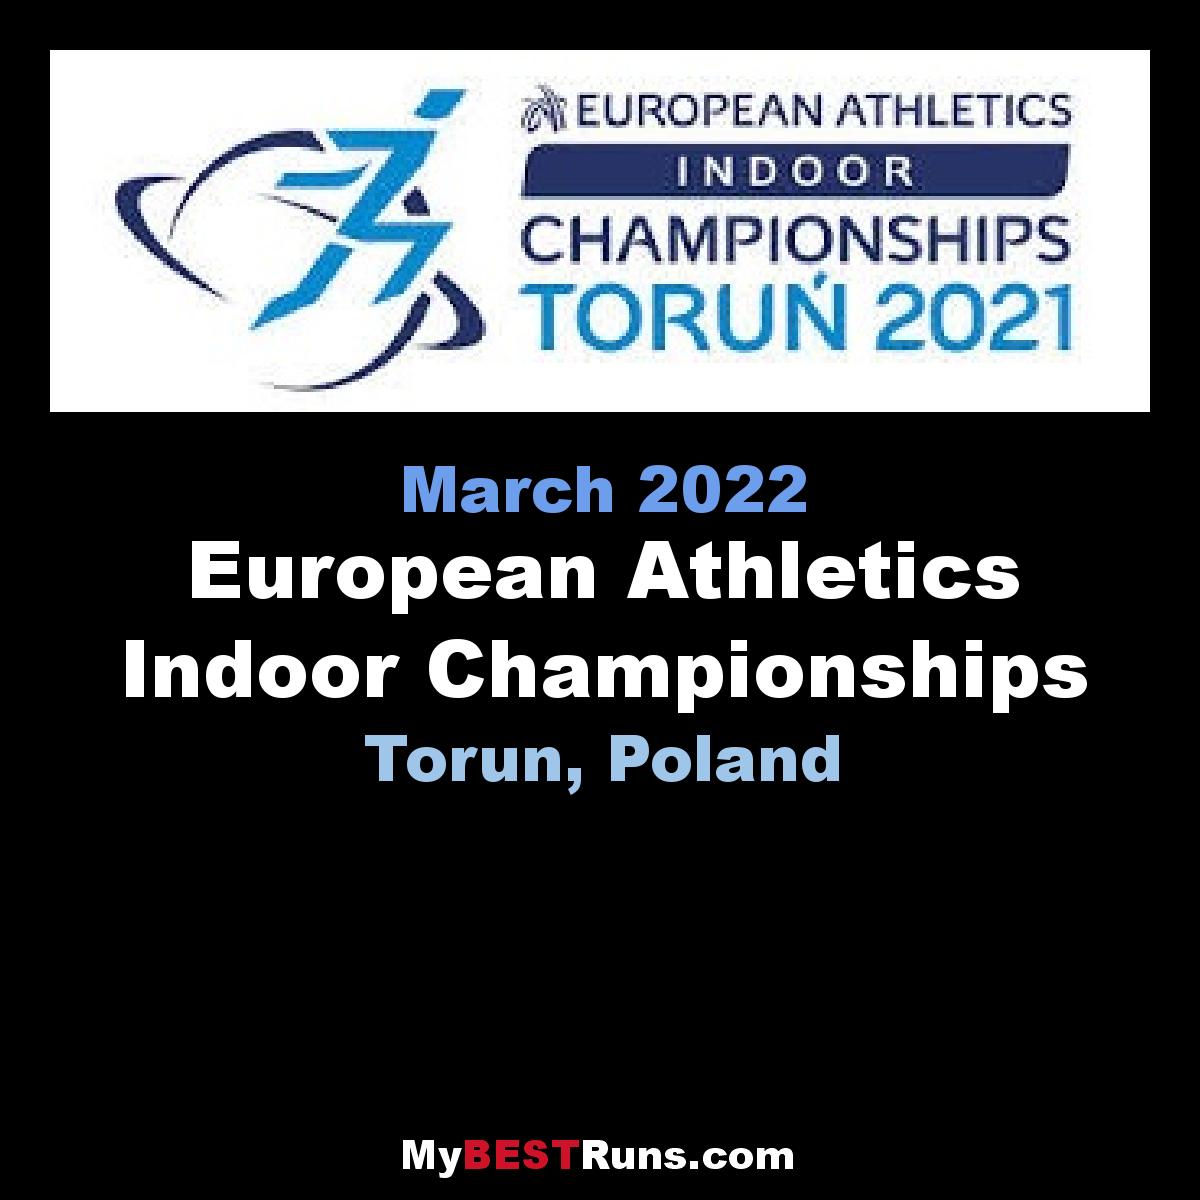 European Athletics Indoor Championships